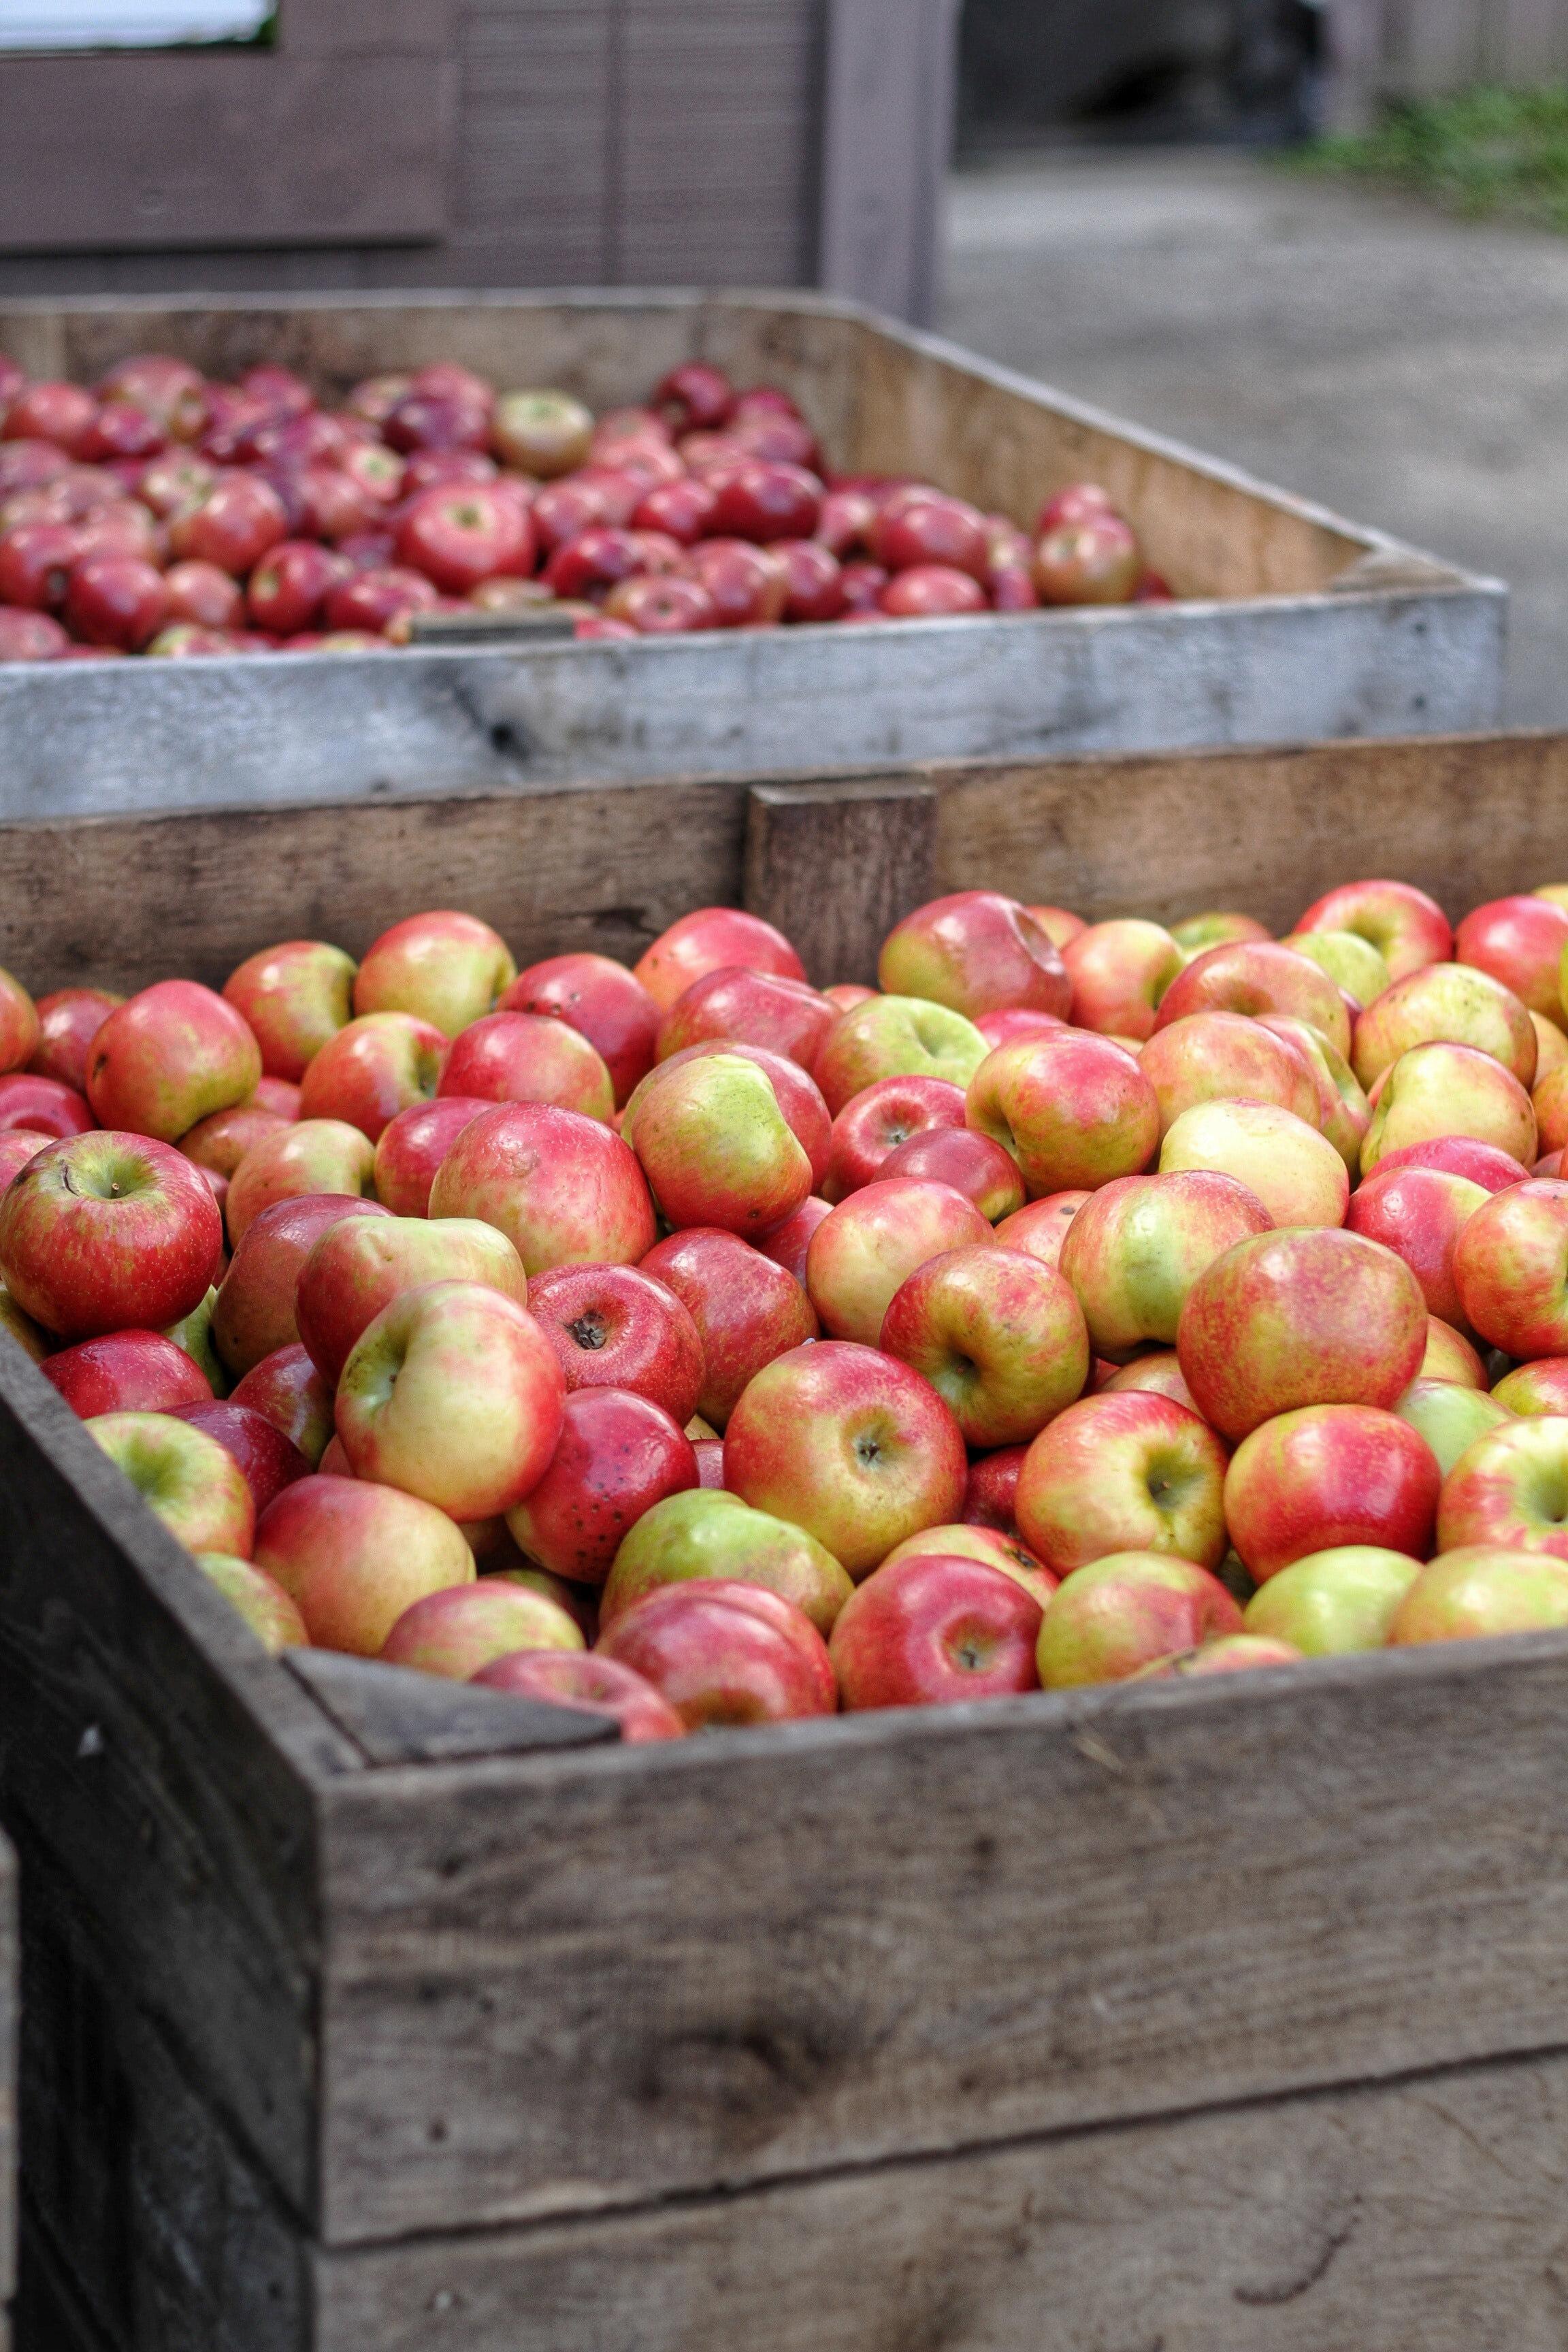 crates of apples edited.jpg